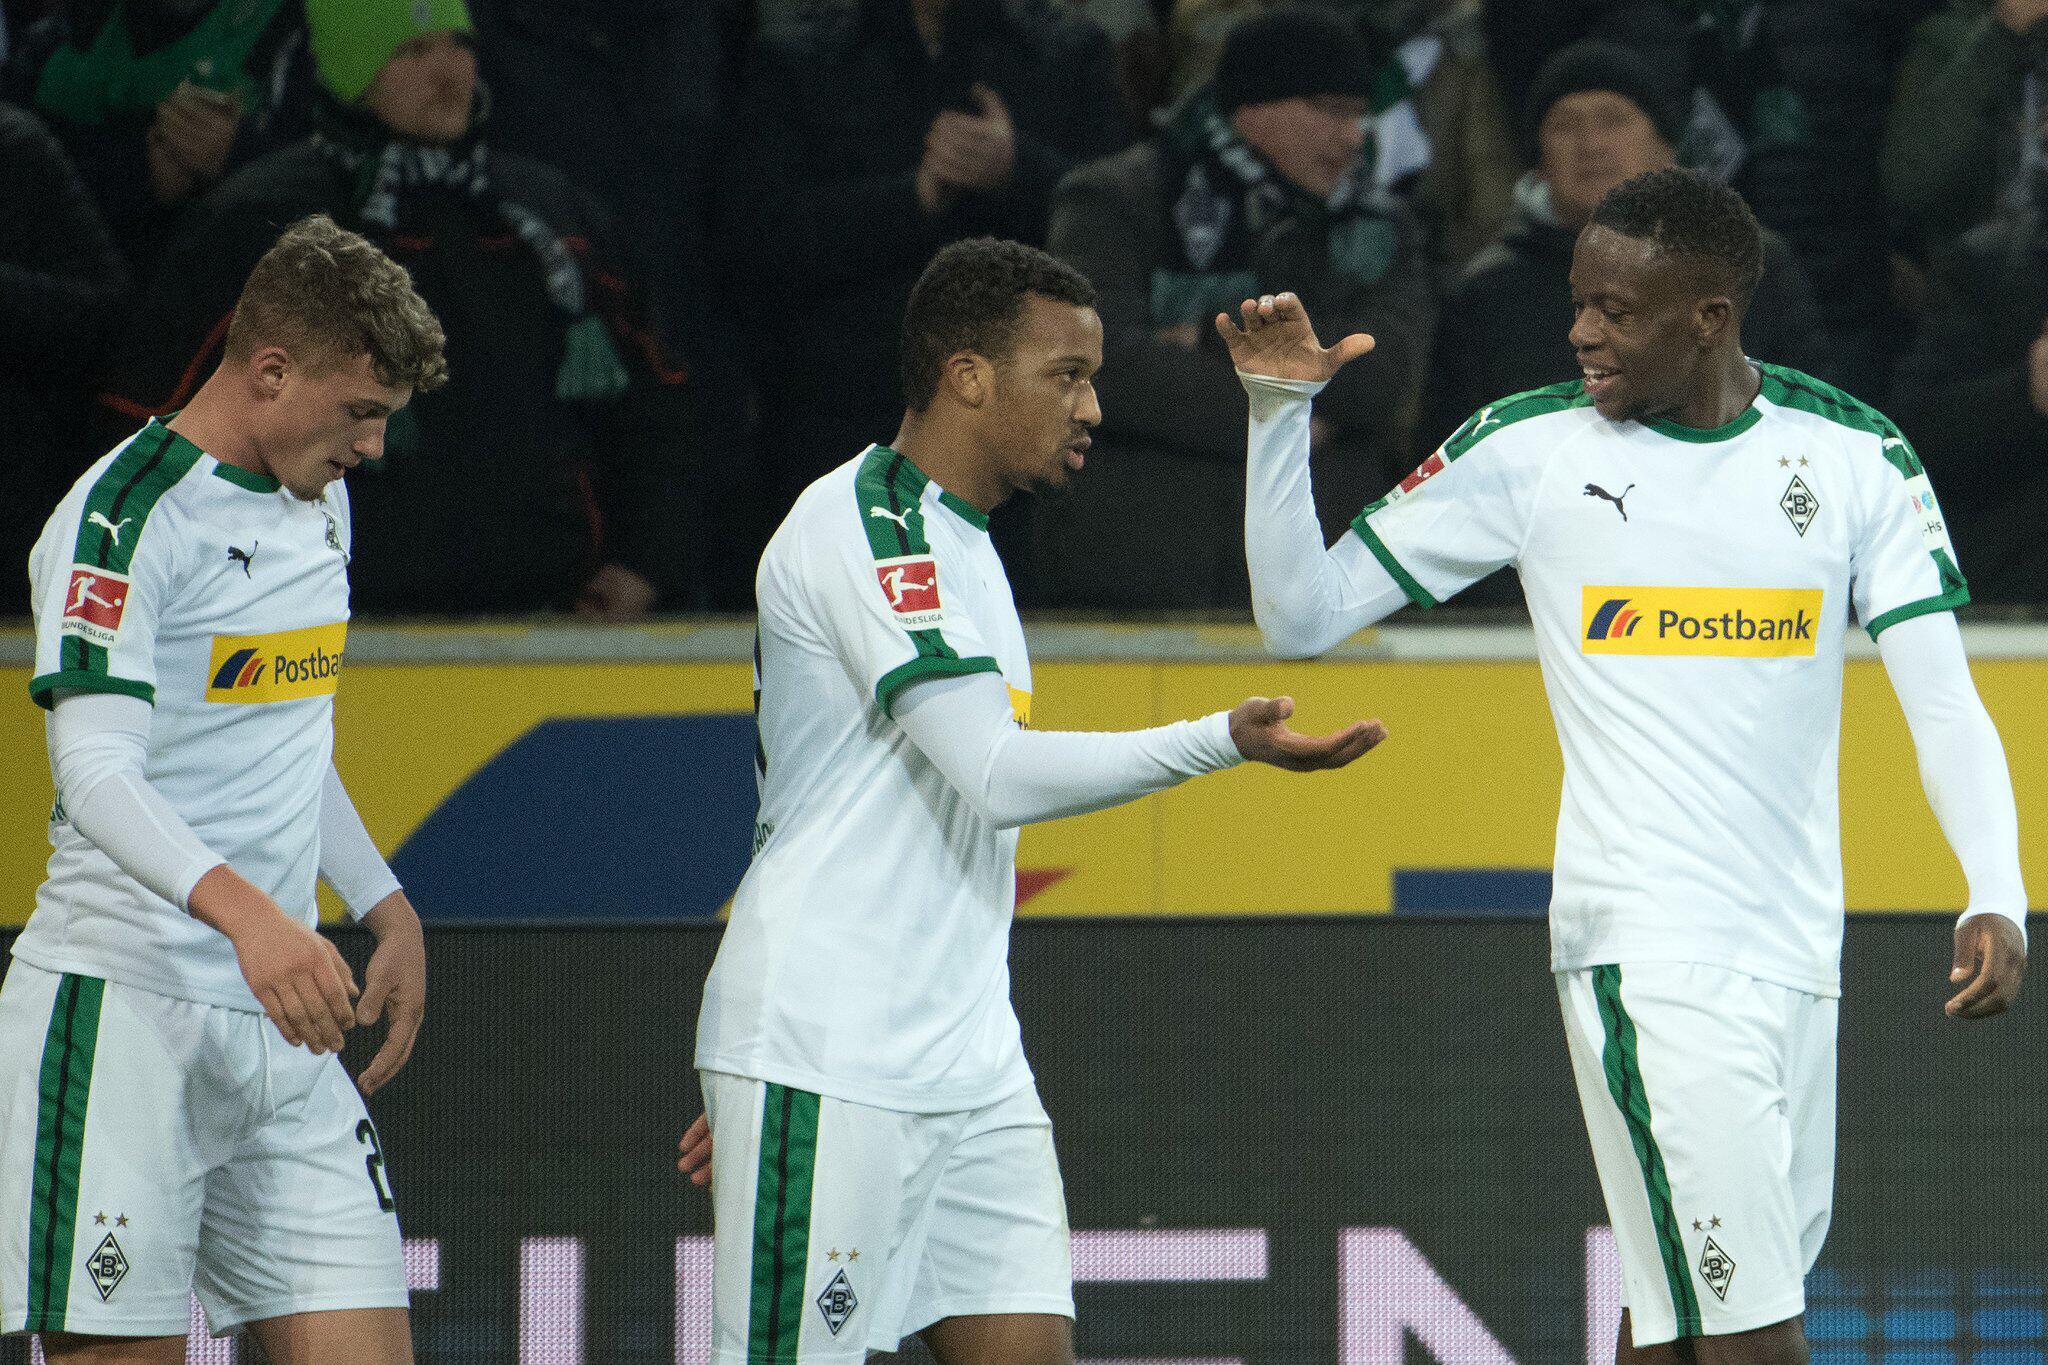 Bild zu Borussia Mönchengladbach - 1st FC Nuremberg